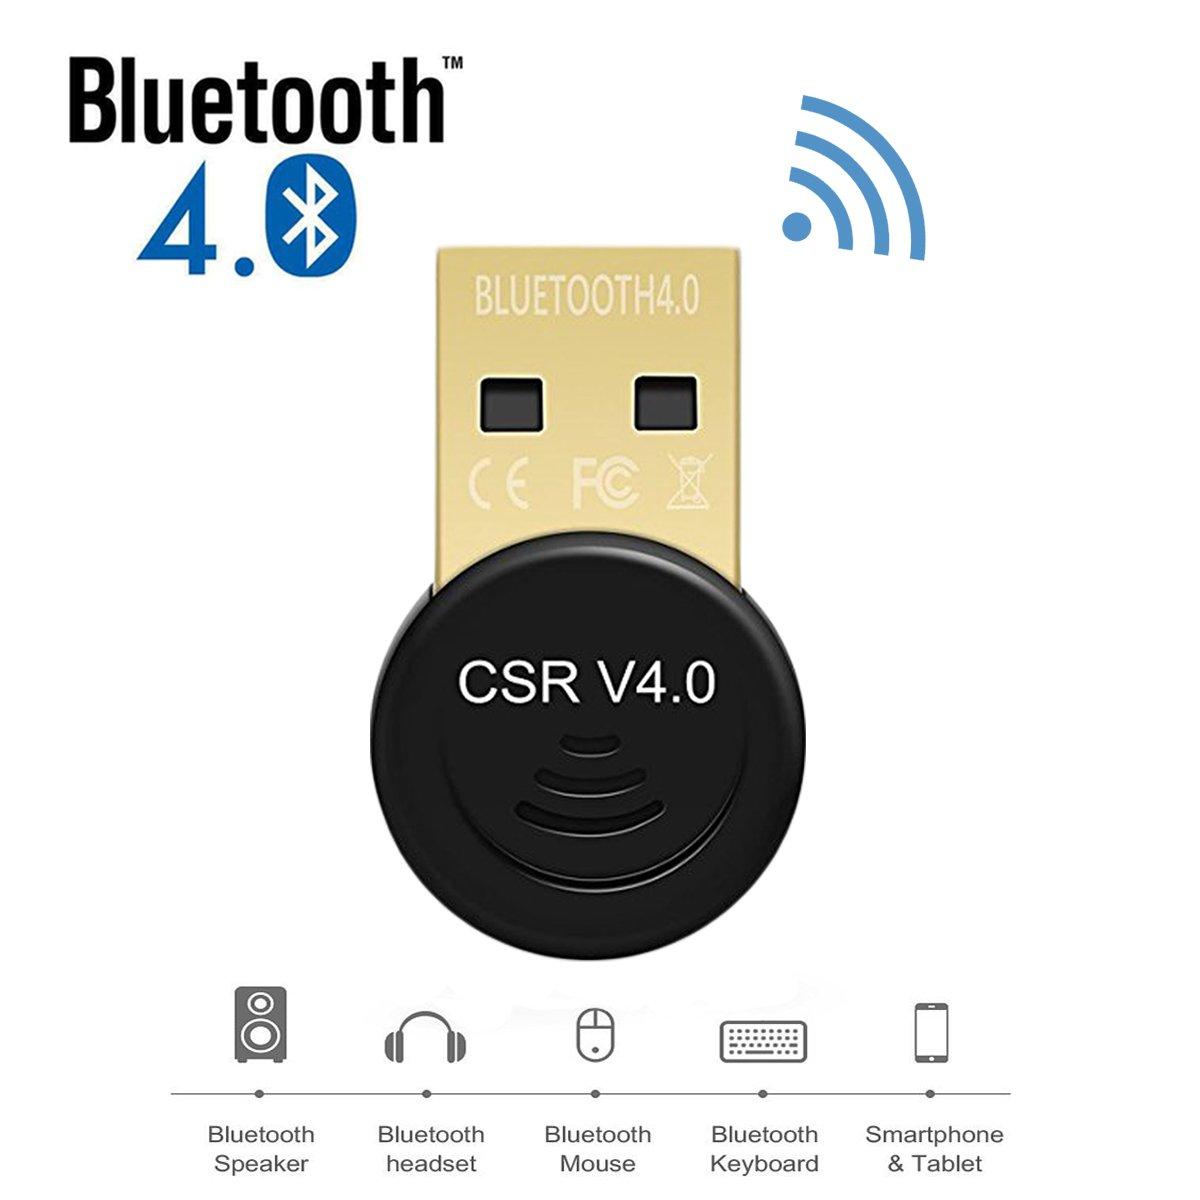 Bluetooth Usb Dongle Driver For Windows 7 32bit